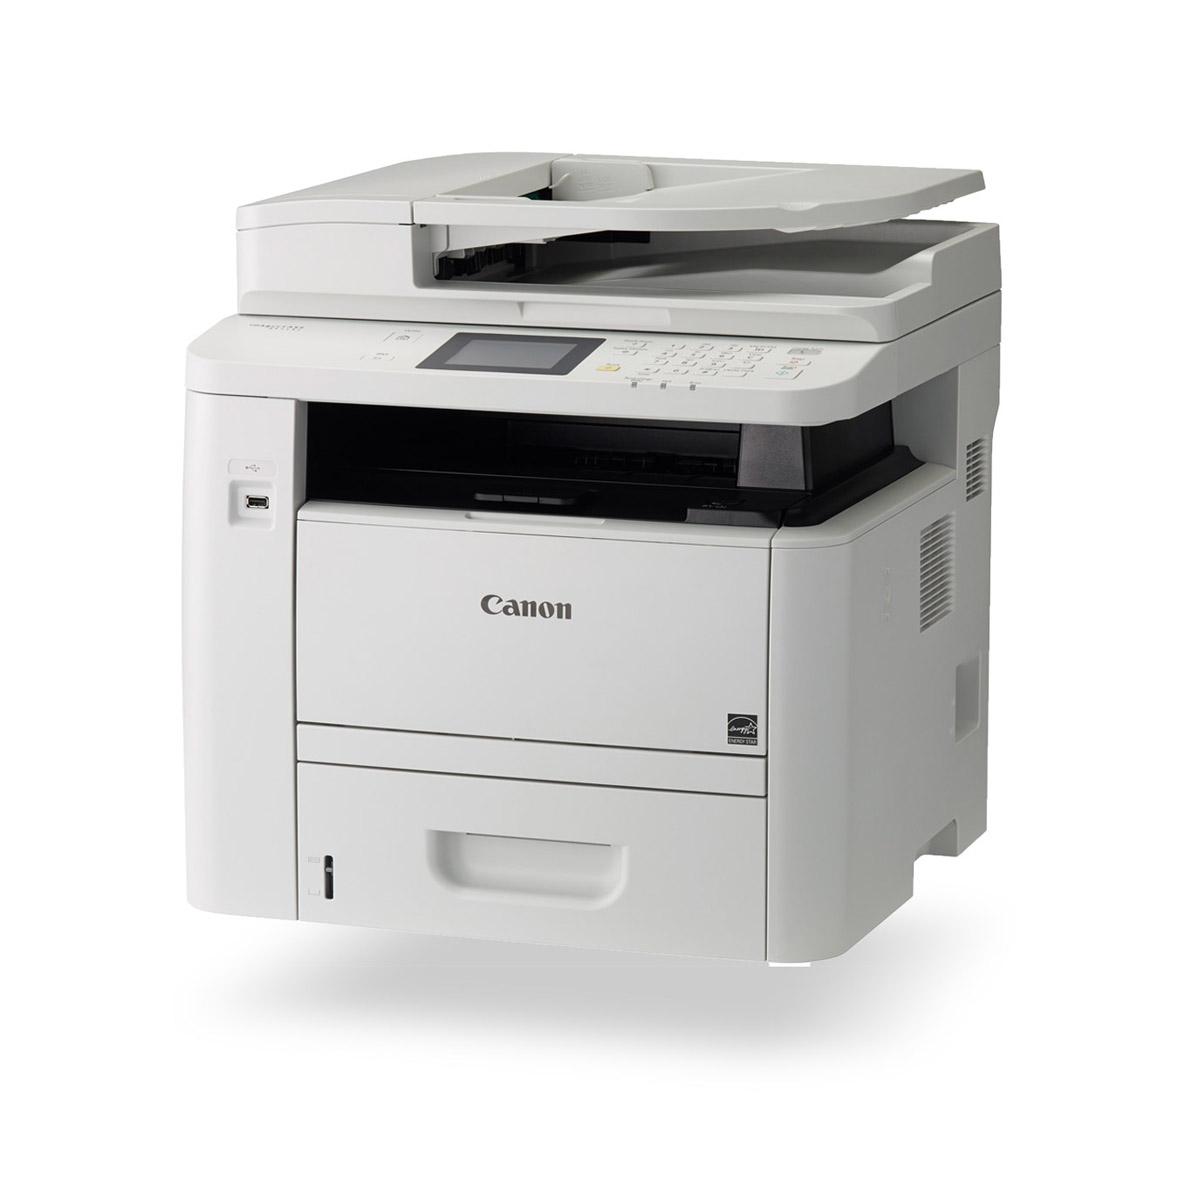 Canon imageCLASS MF419x Multifunction Laser Printer front angle